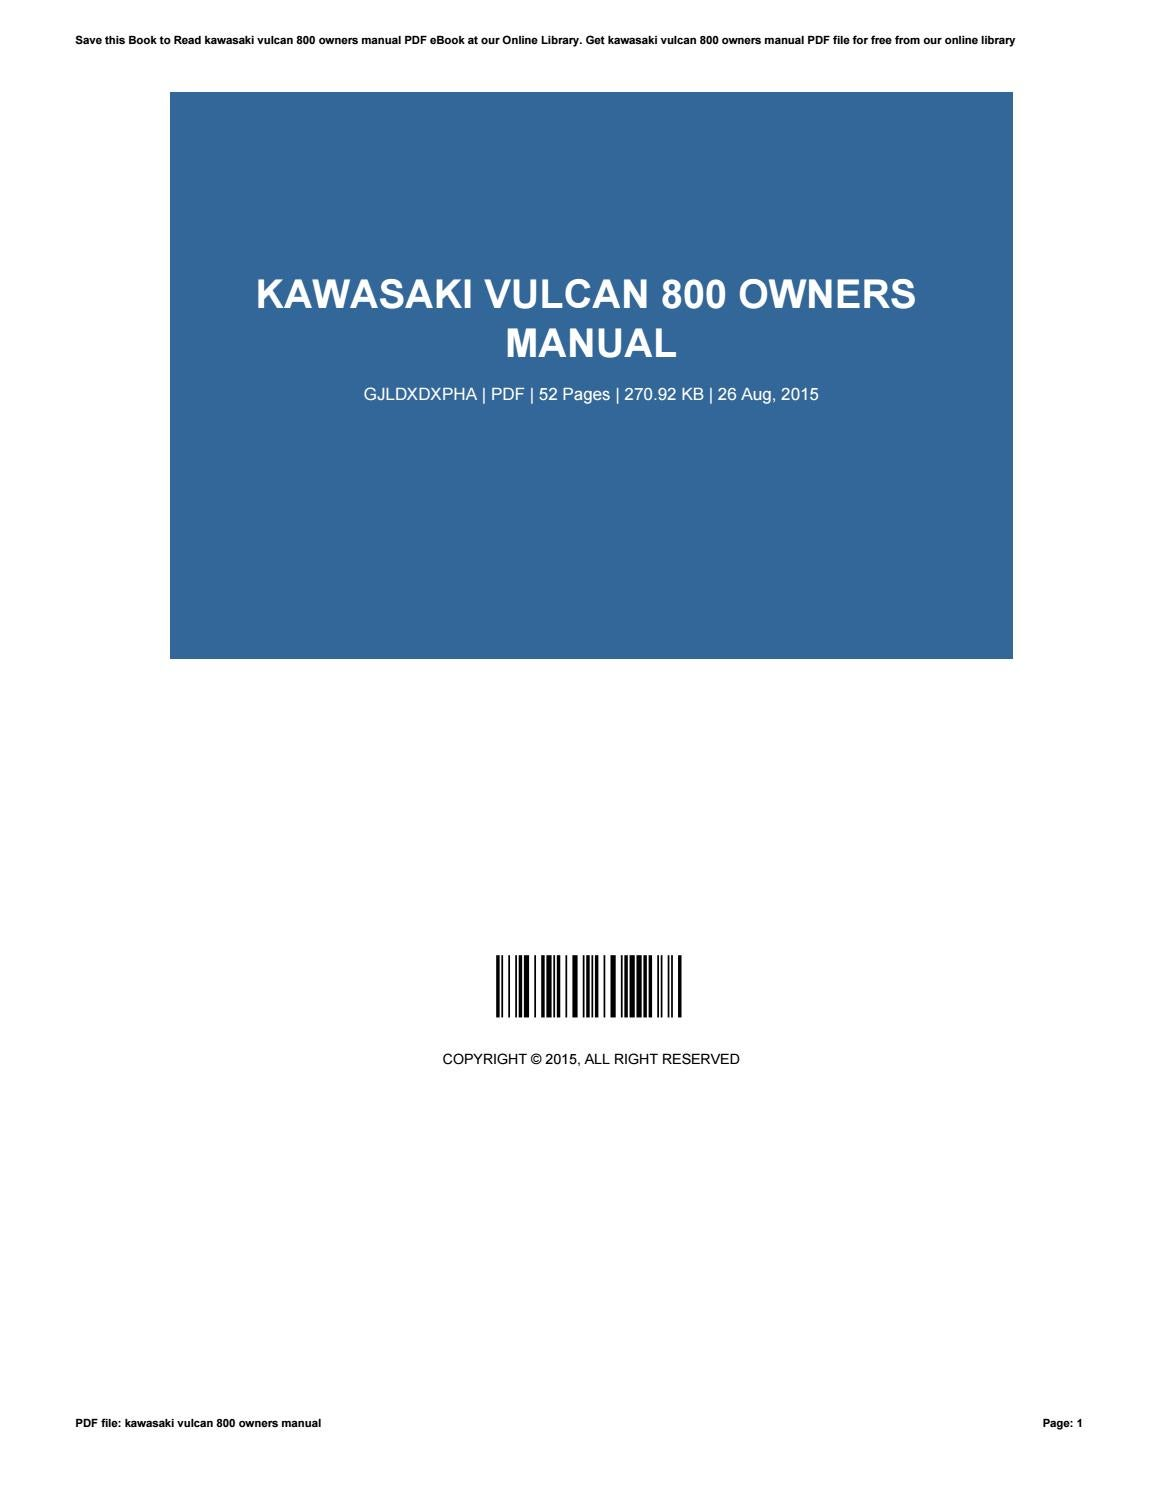 Kawasaki Vulcan Owners Manual Pdf